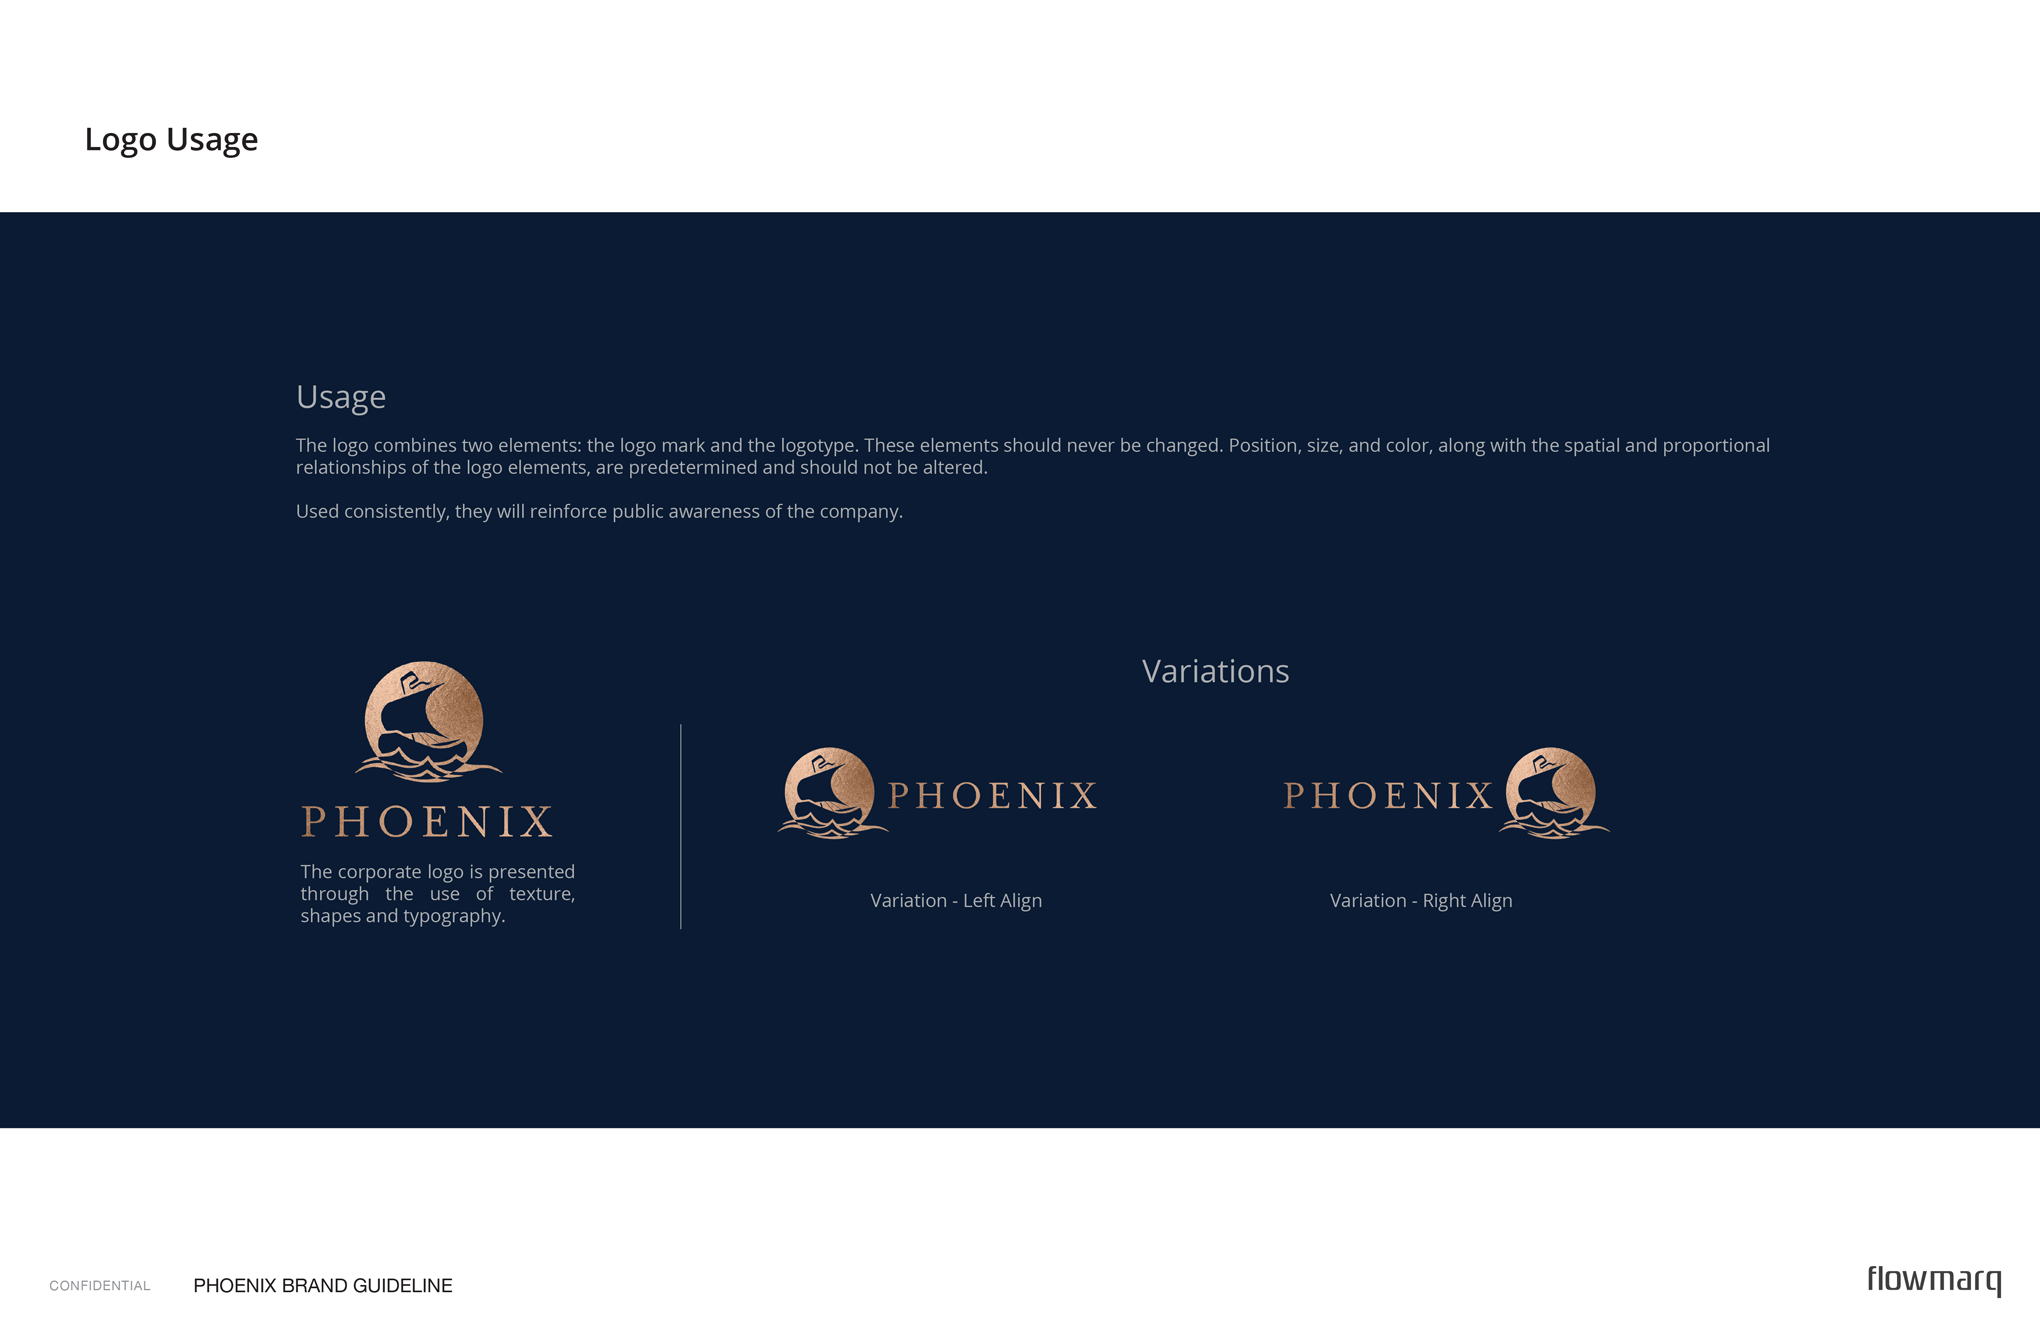 Logo Usage & Logo Design - Phoenix